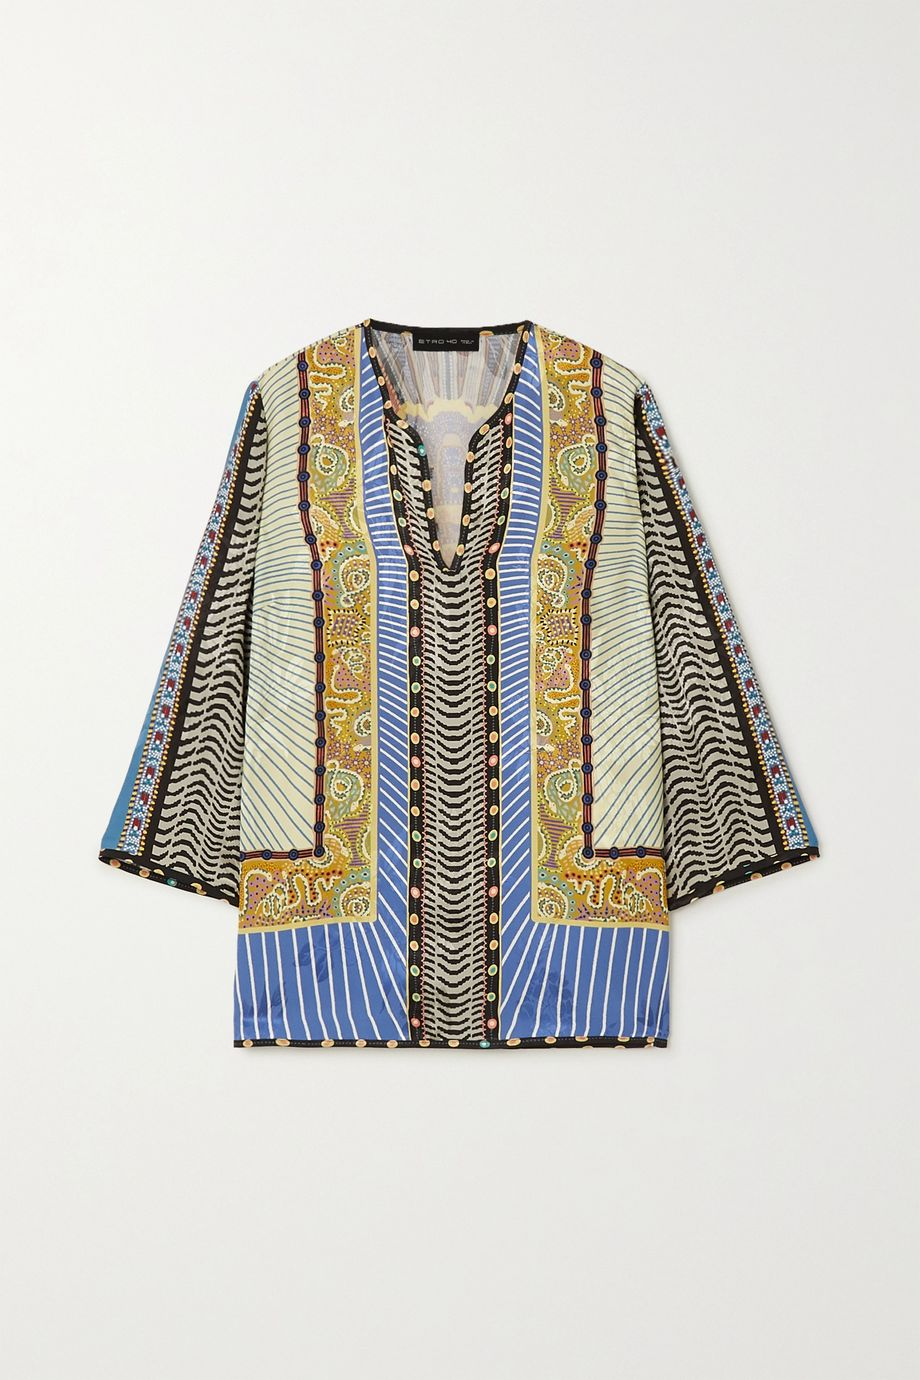 Etro Printed floral-jacquard blouse